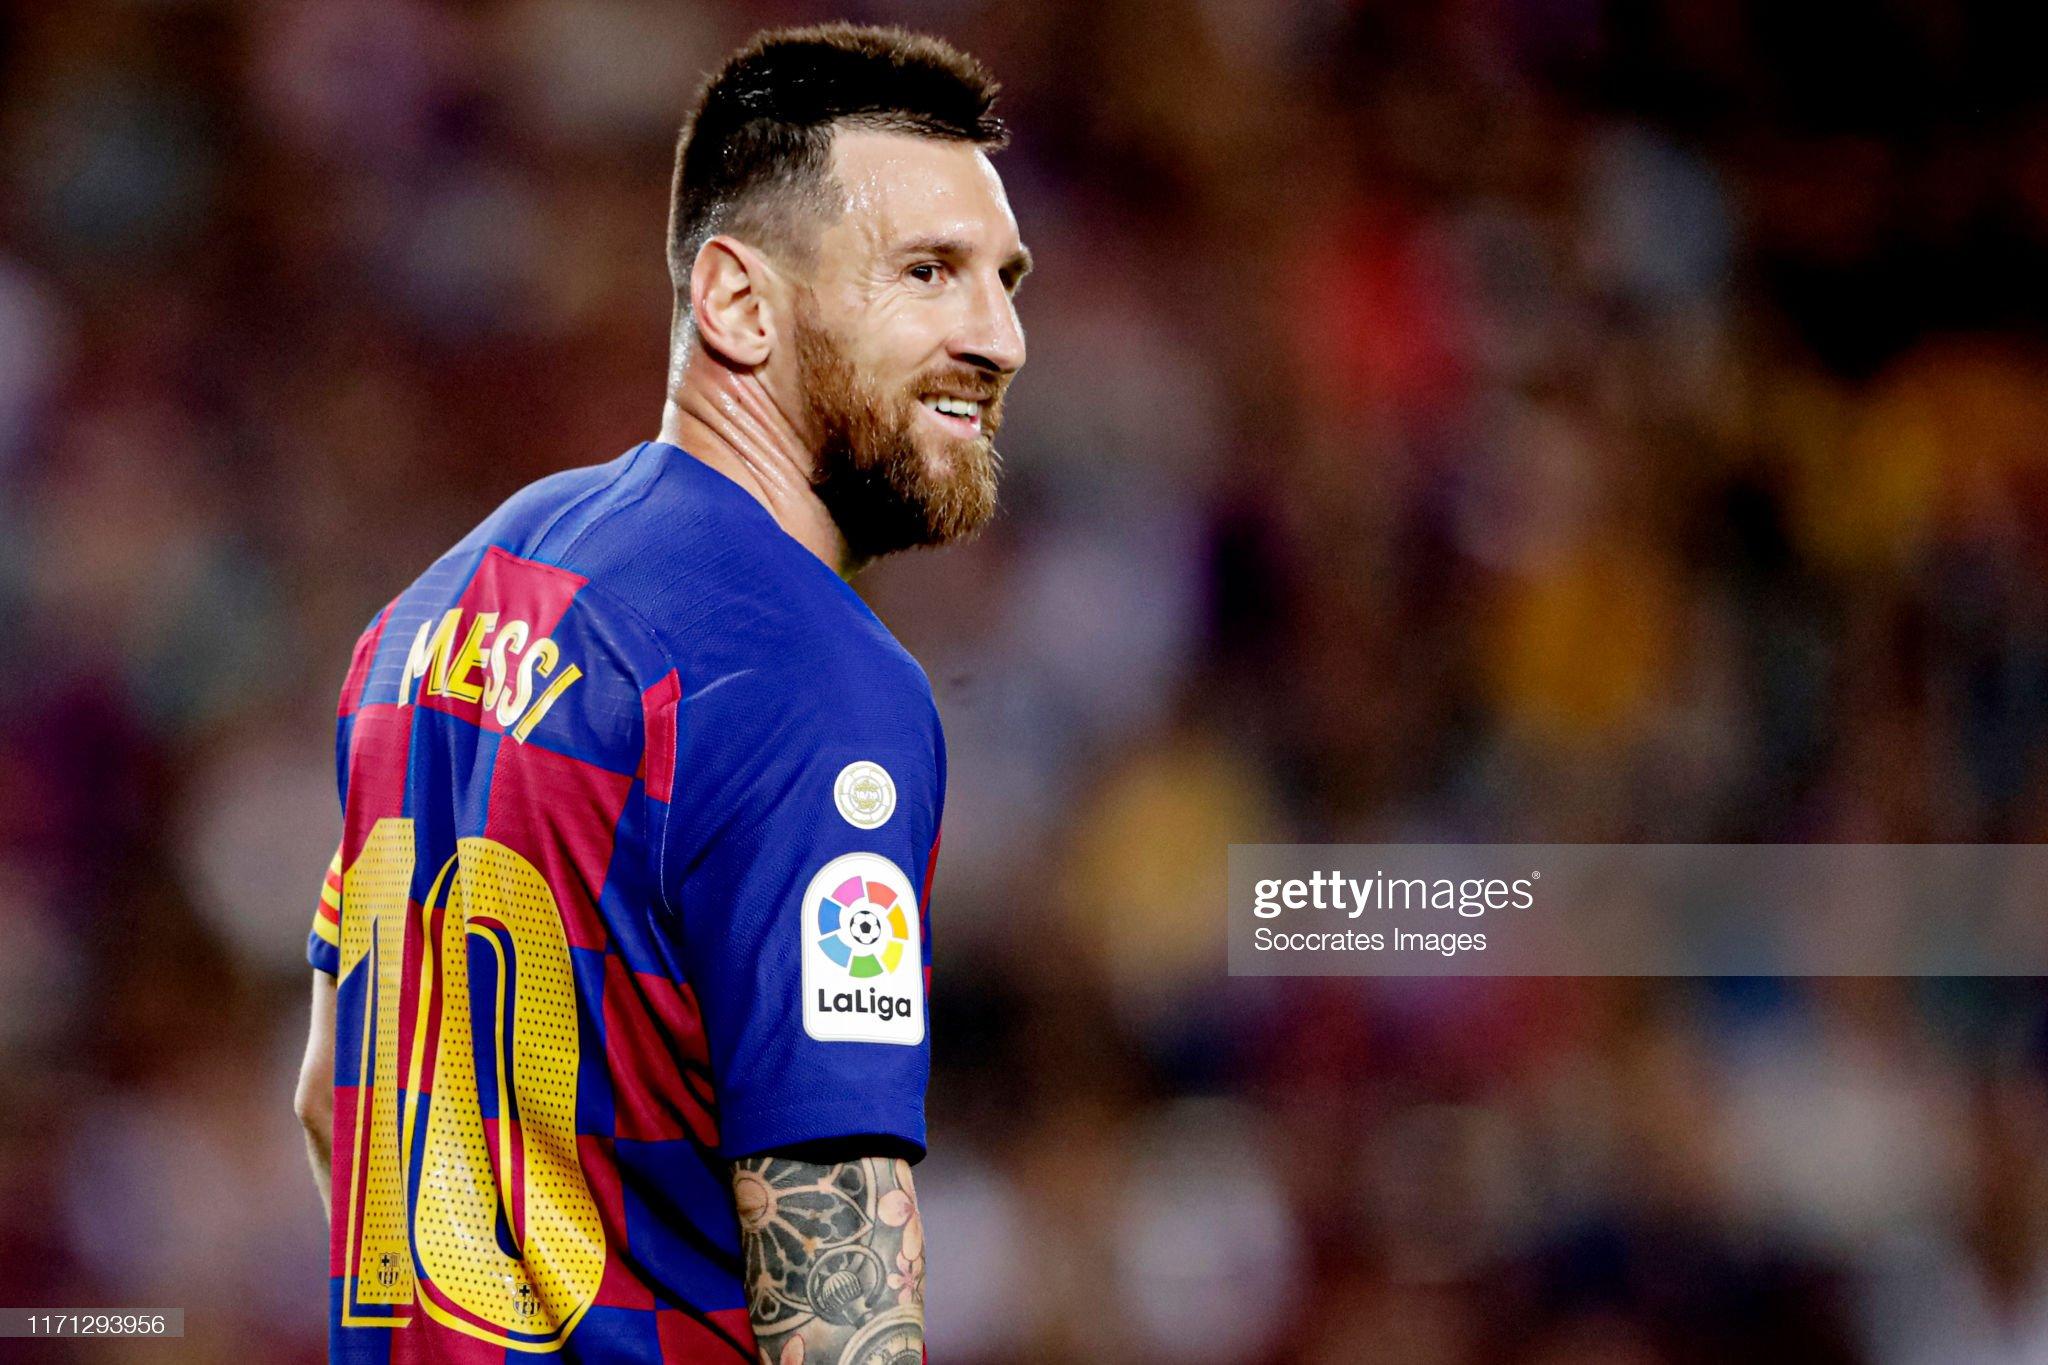 صور مباراة : برشلونة - فياريال 2-1 ( 24-09-2019 )  Lionel-messi-of-fc-barcelona-during-the-la-liga-santander-match-fc-picture-id1171293956?s=2048x2048